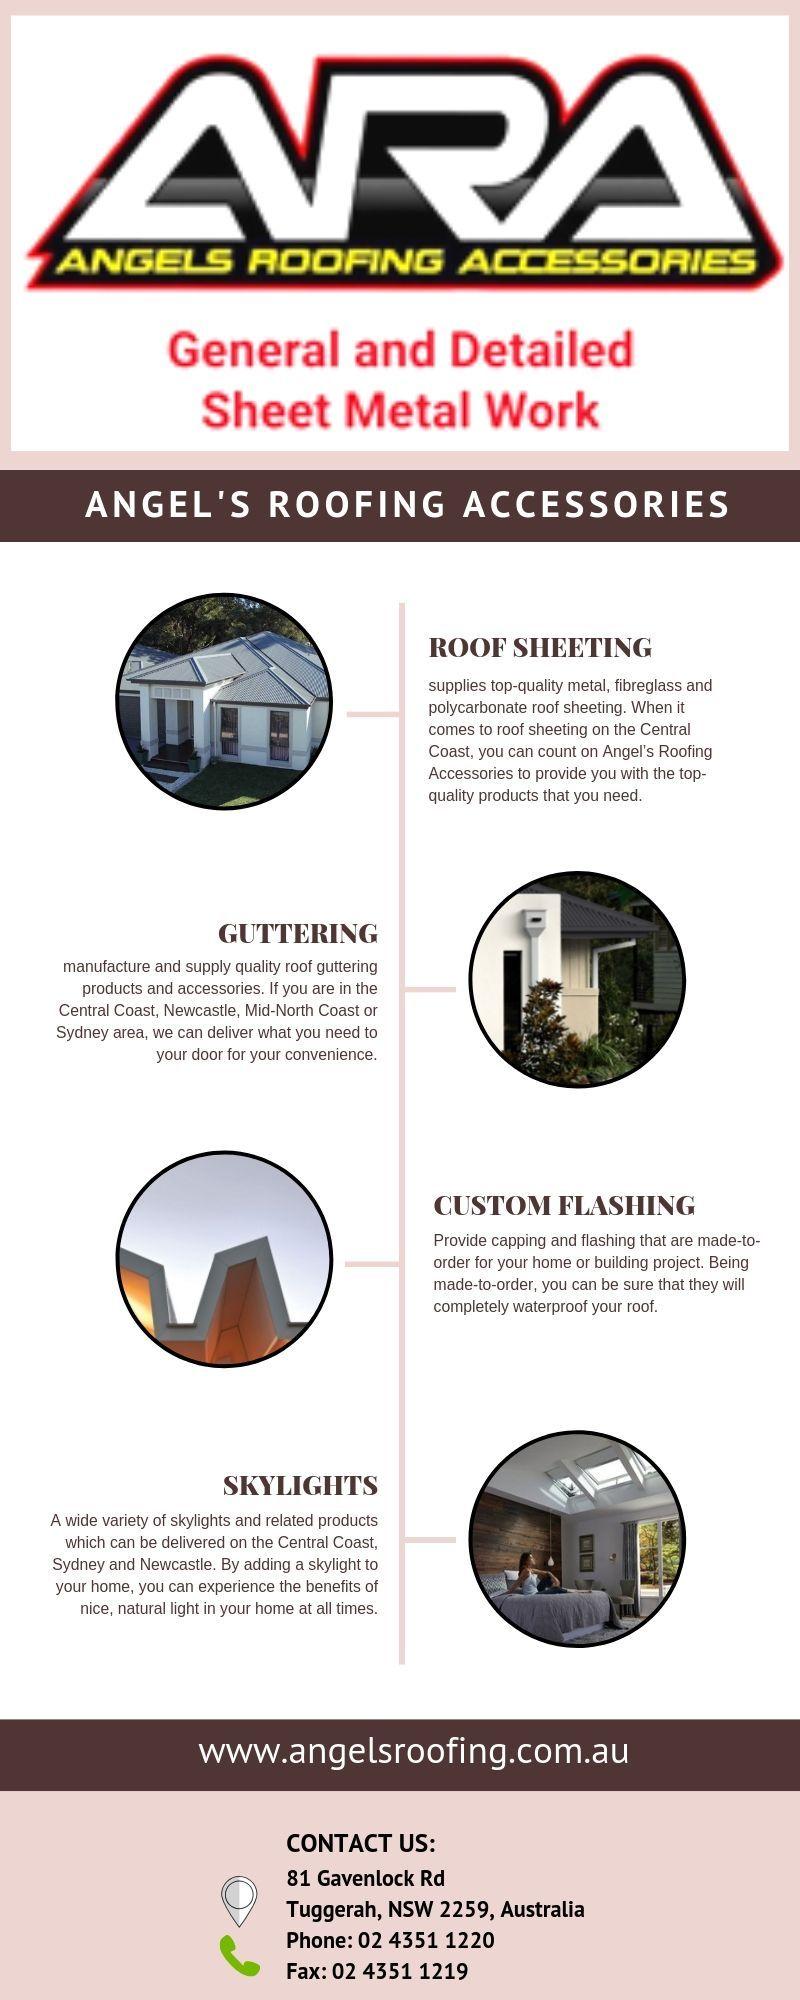 Angel's Roofing Accessories supplies top-quality metal, fiberglass